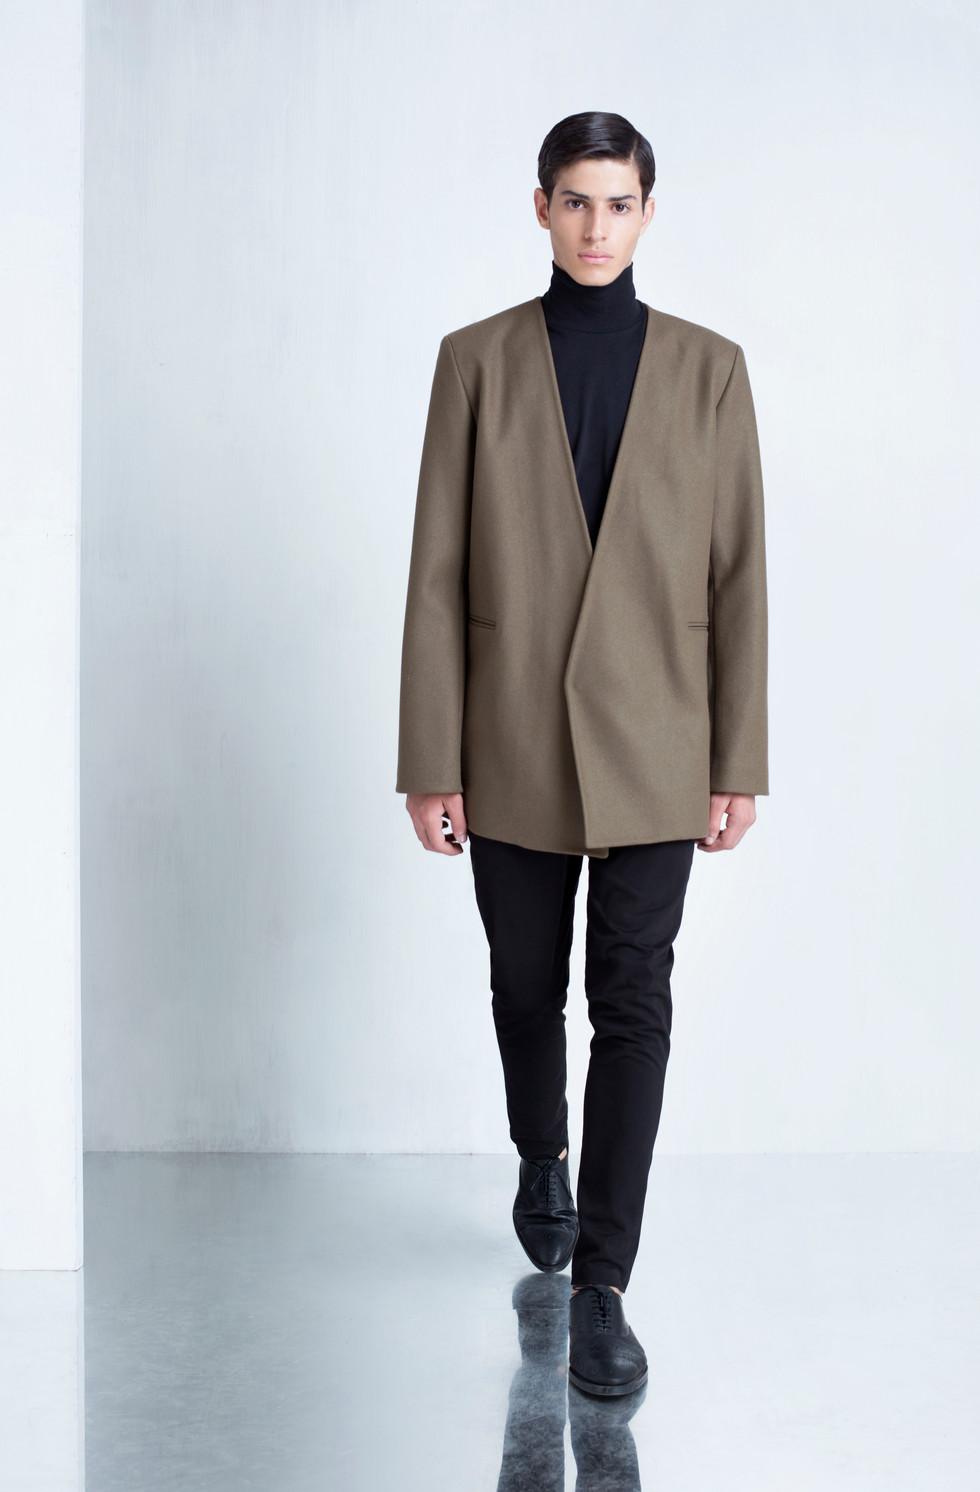 Ariel_Bassan_Minimal_Menswear_AW_LookBook_Lapelless_Wool_Coat